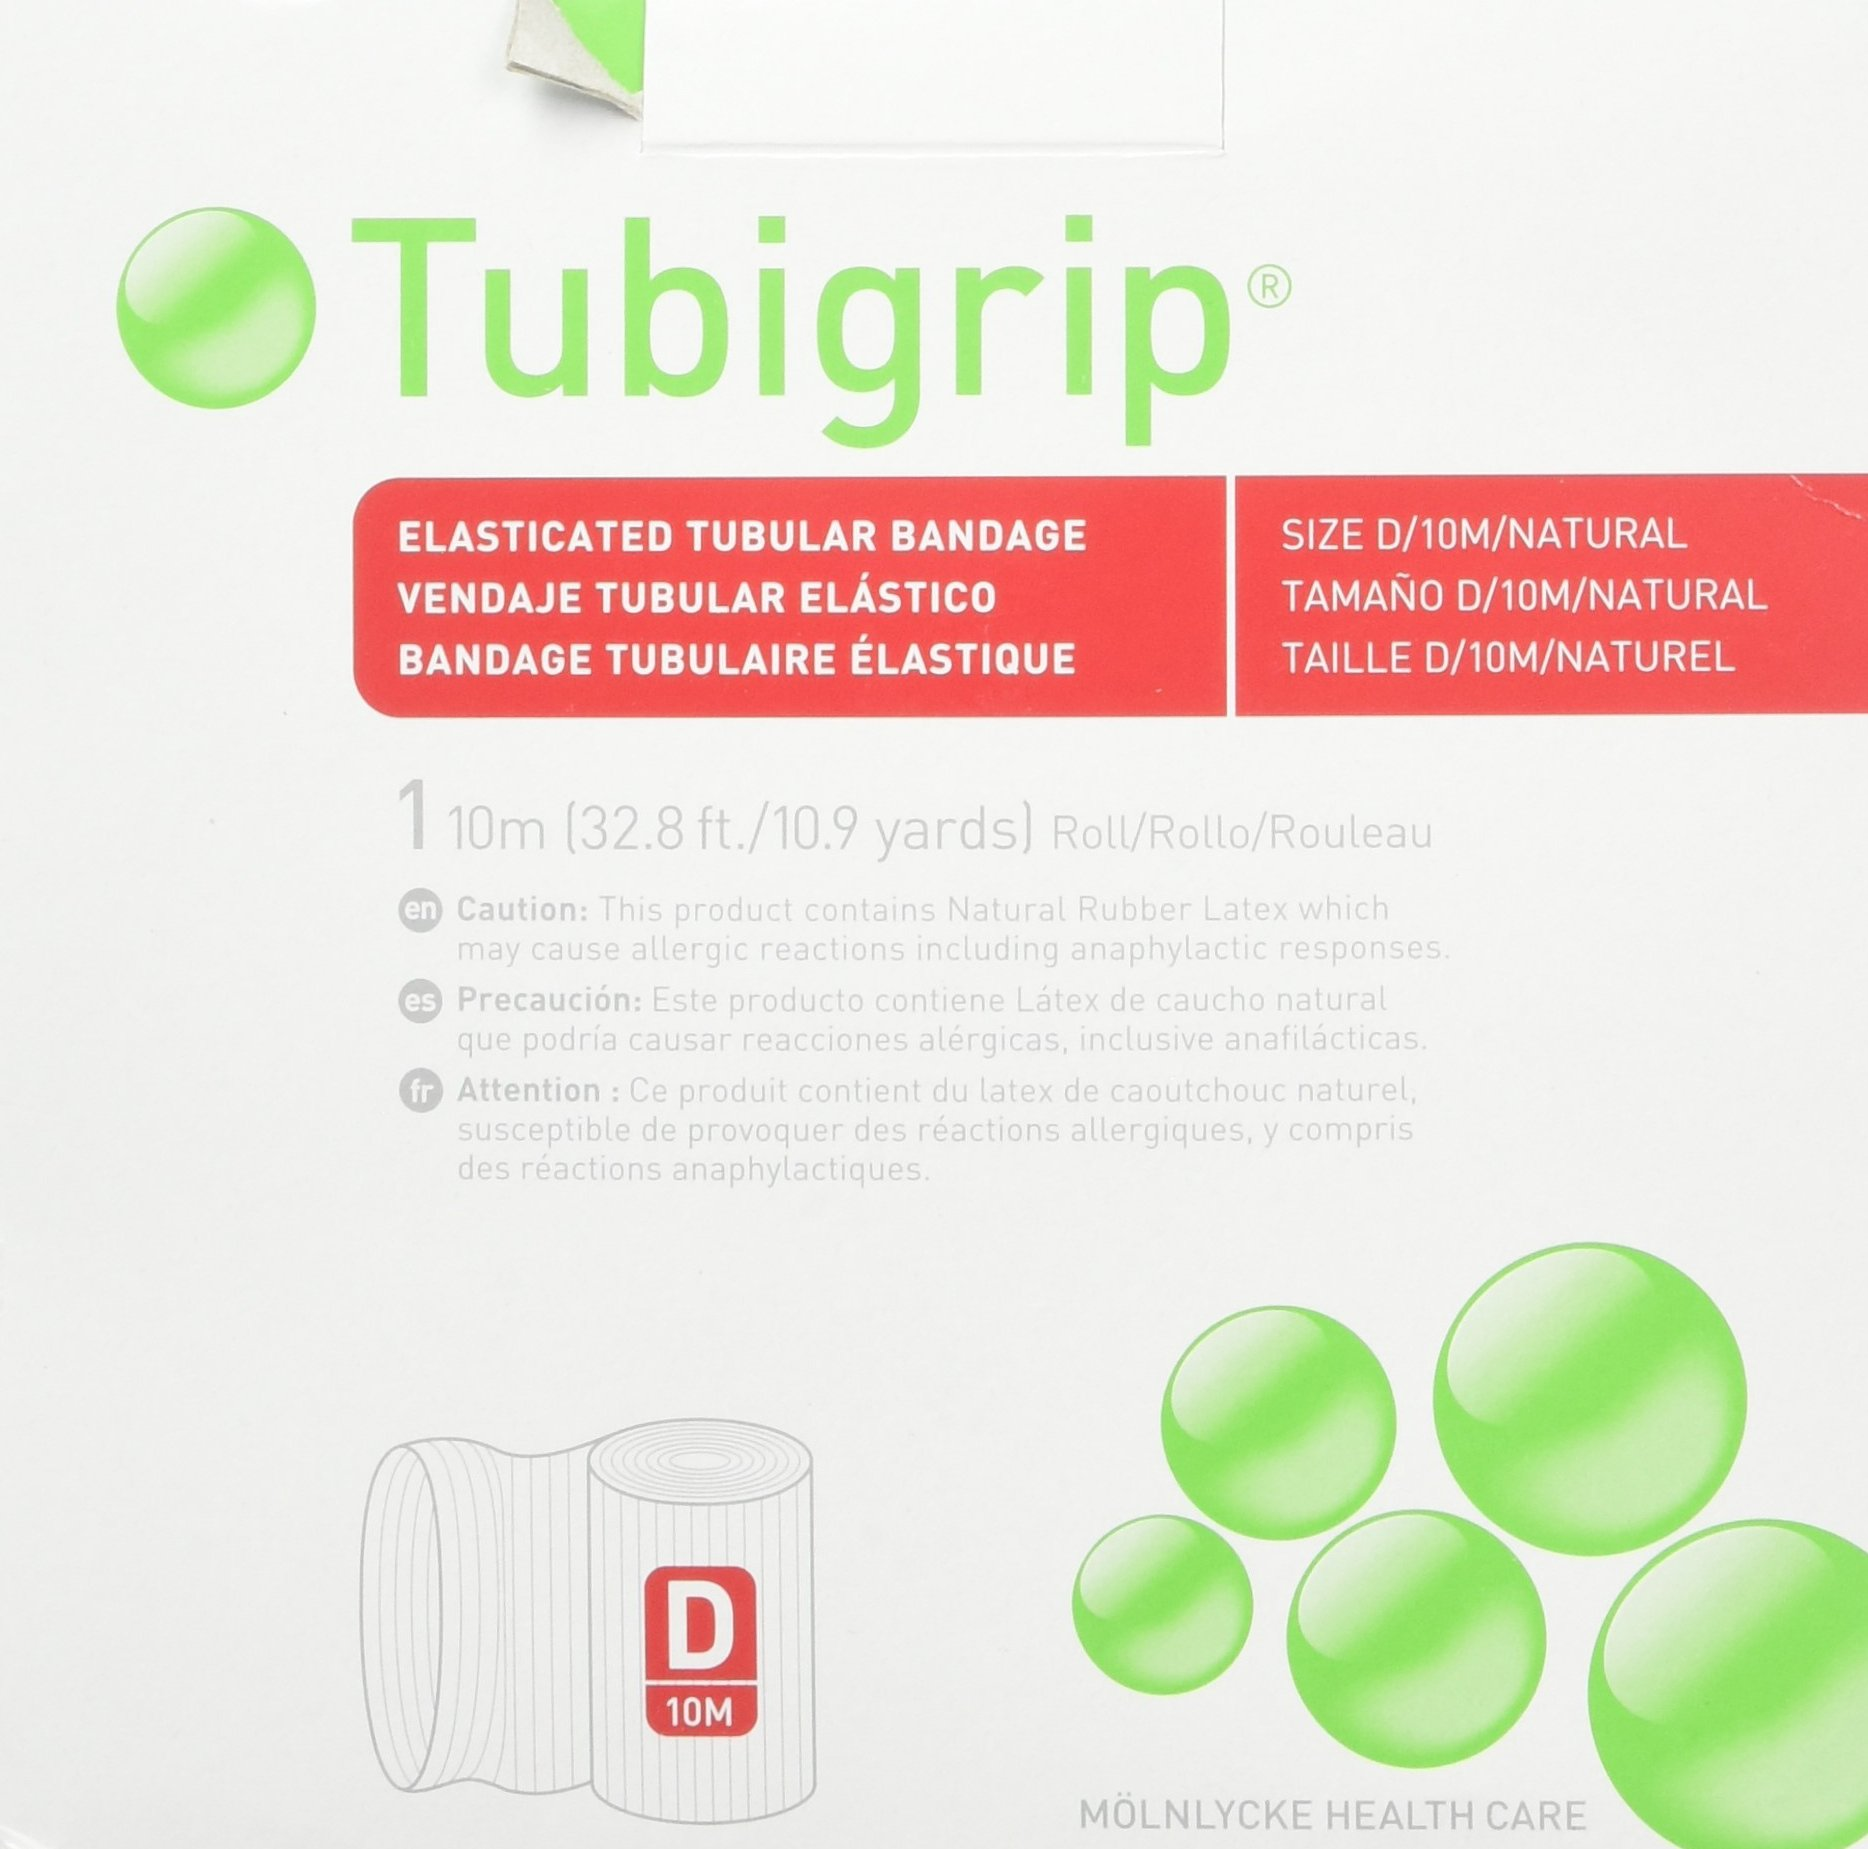 Tubigrip Tubular Bandage Size D, 10M Box (2 Pack)